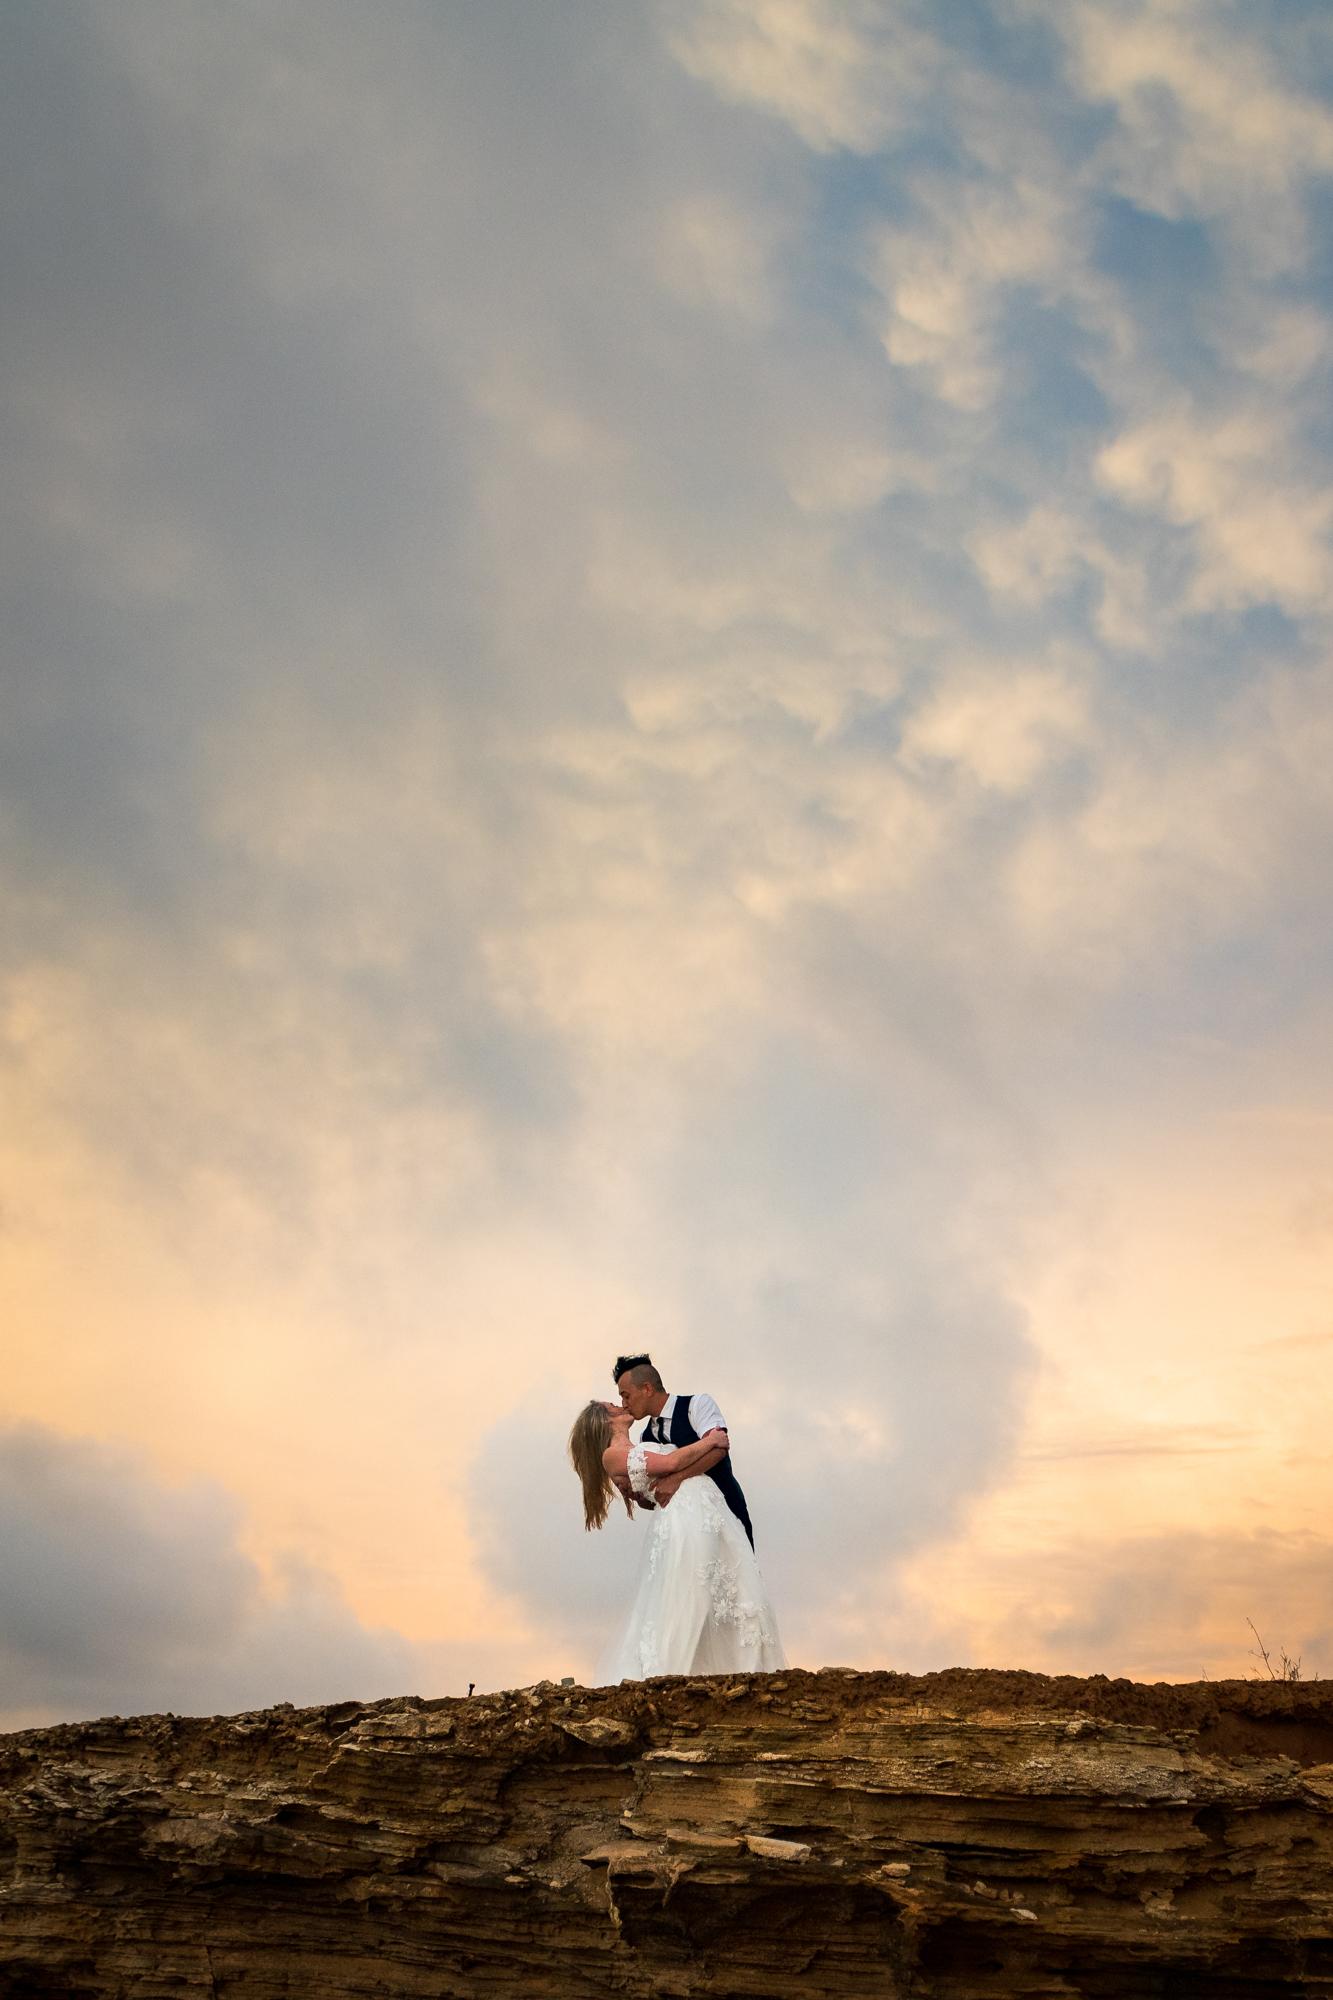 sunrise-wedding-coleen-shipwrecks-6-29-2919-9158.jpg